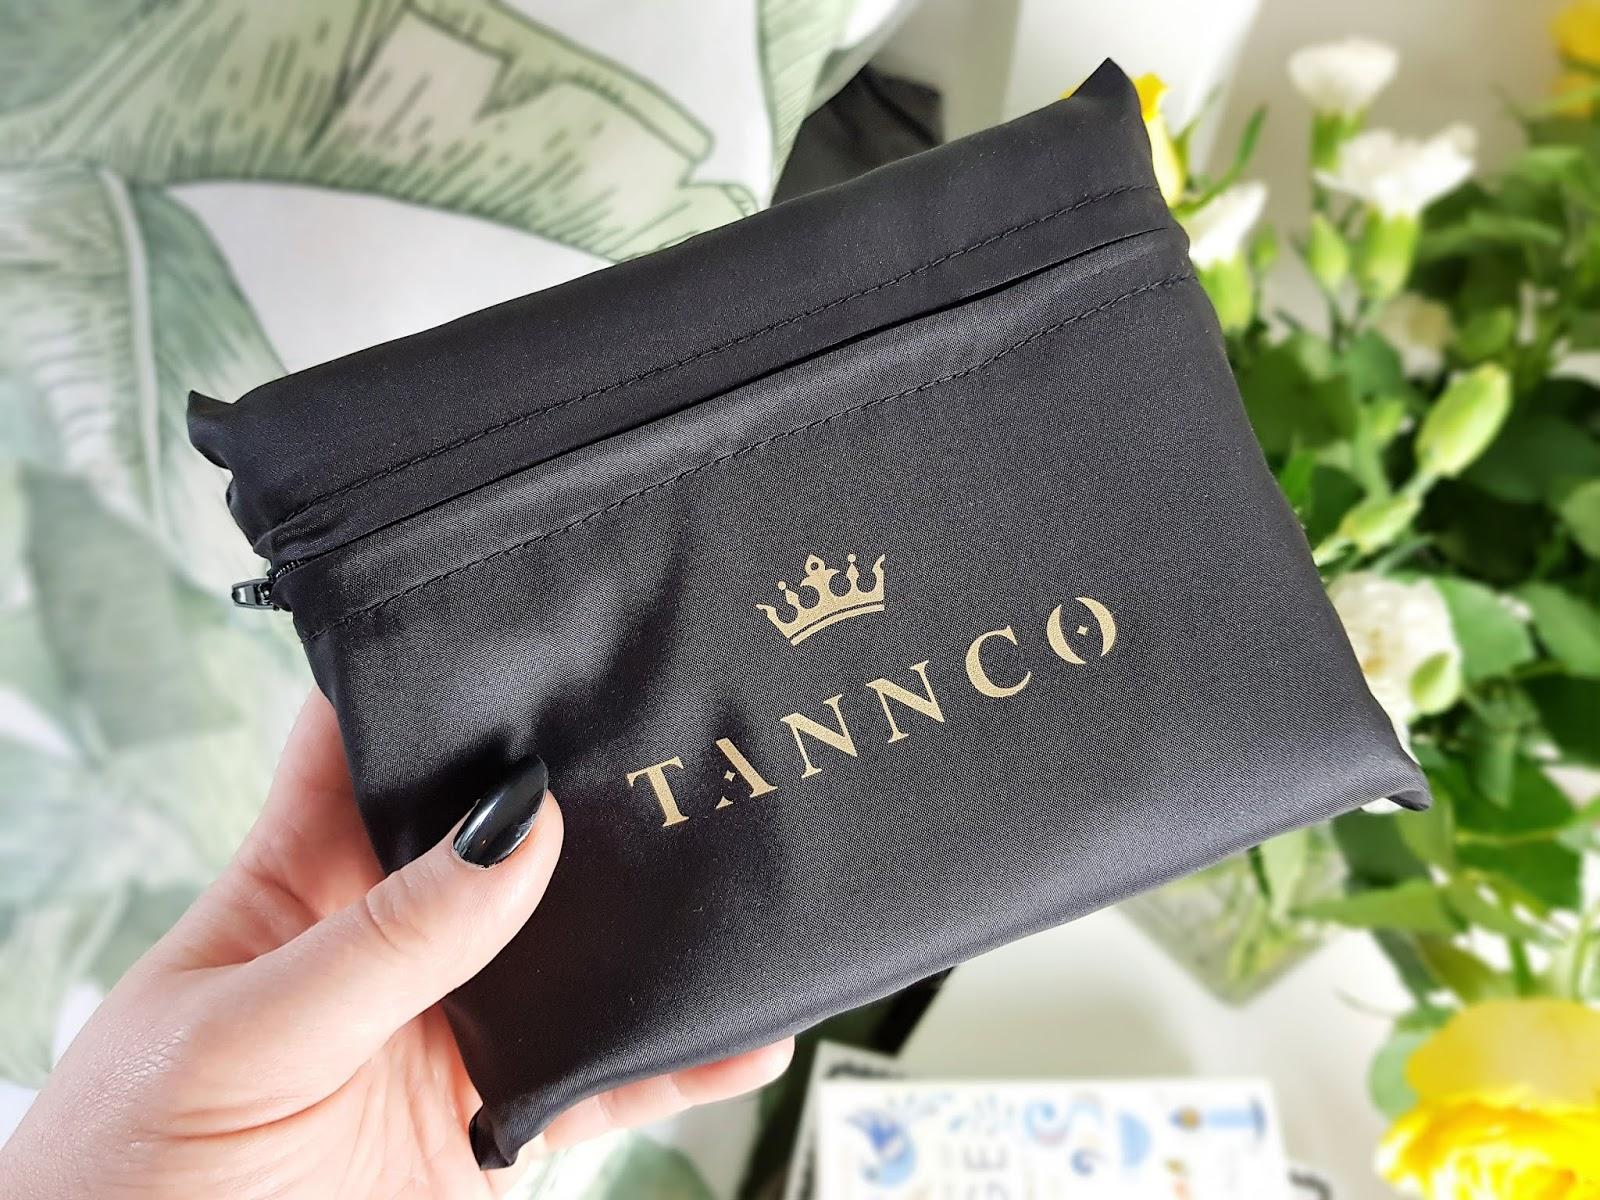 Tannco Black Tan Protector Sheet